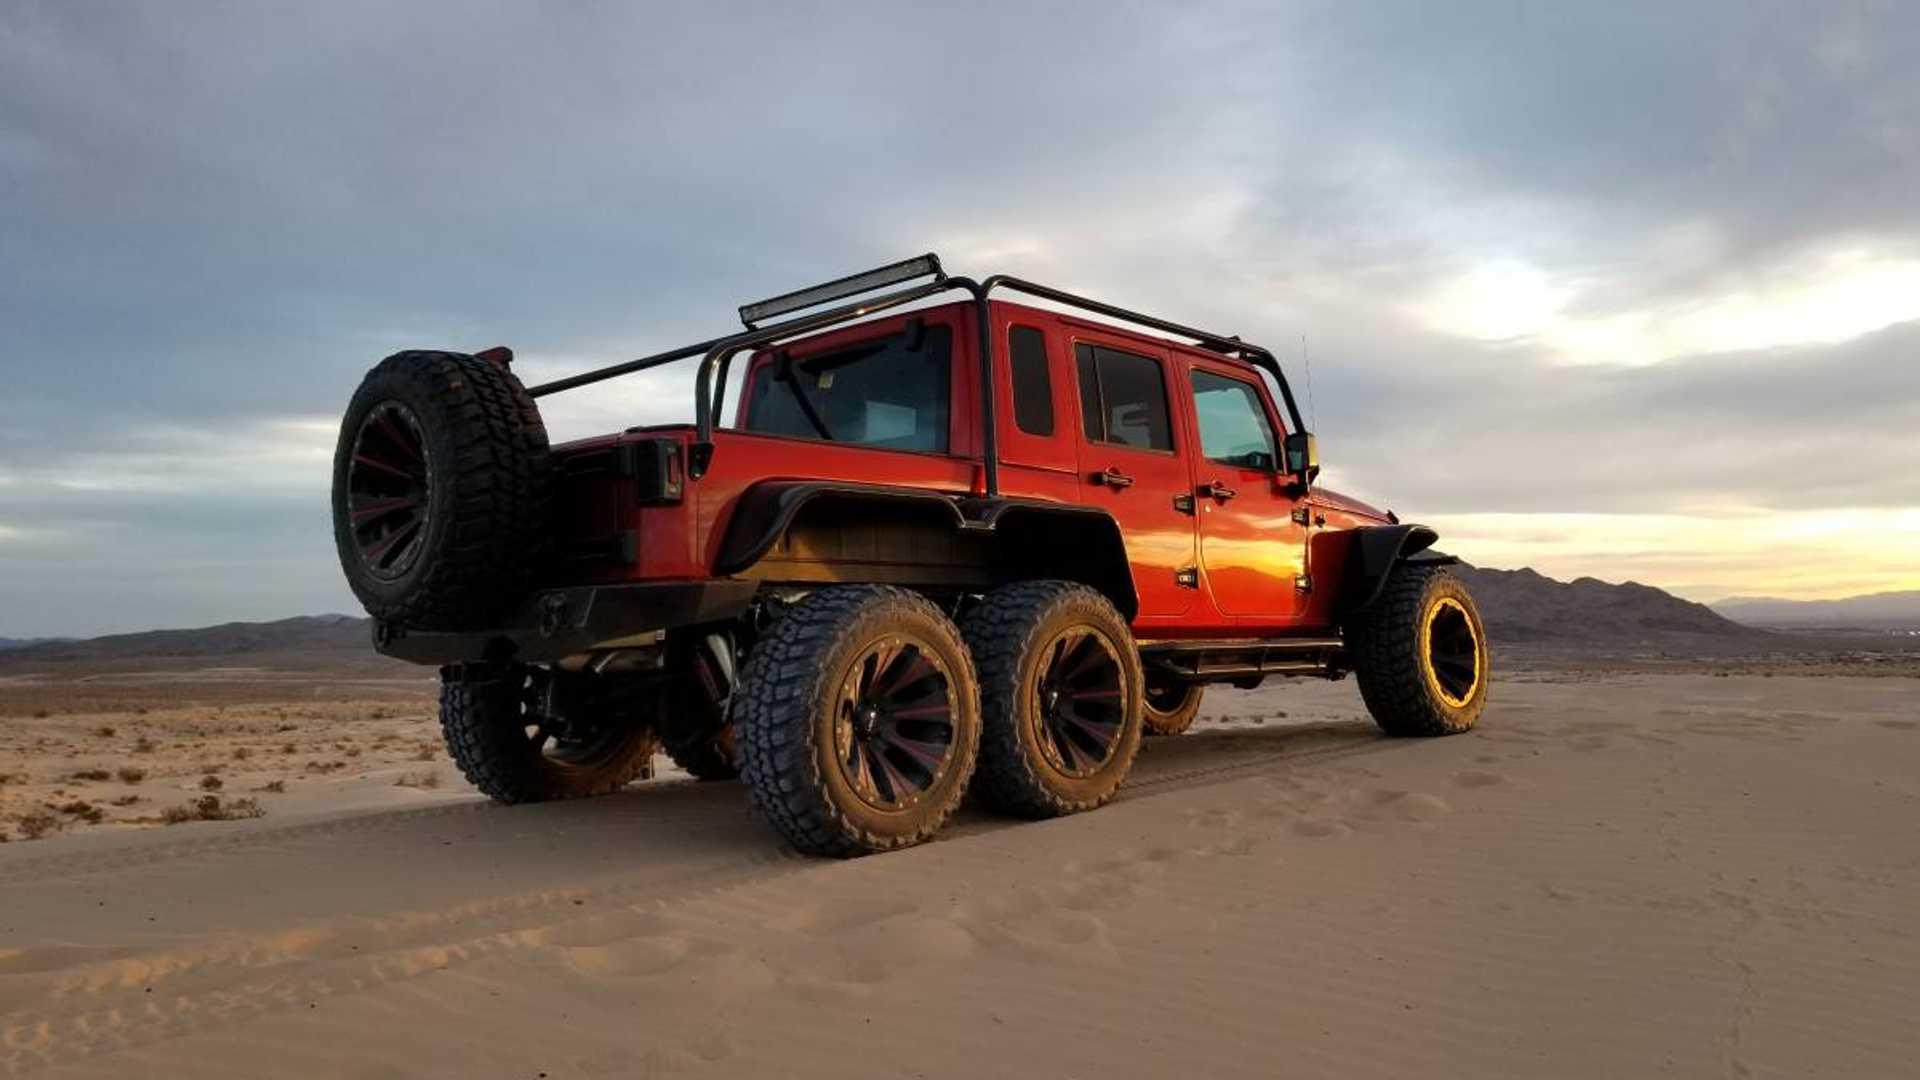 hellcat-motorlu-jeep-wrangler-6x6 (1)